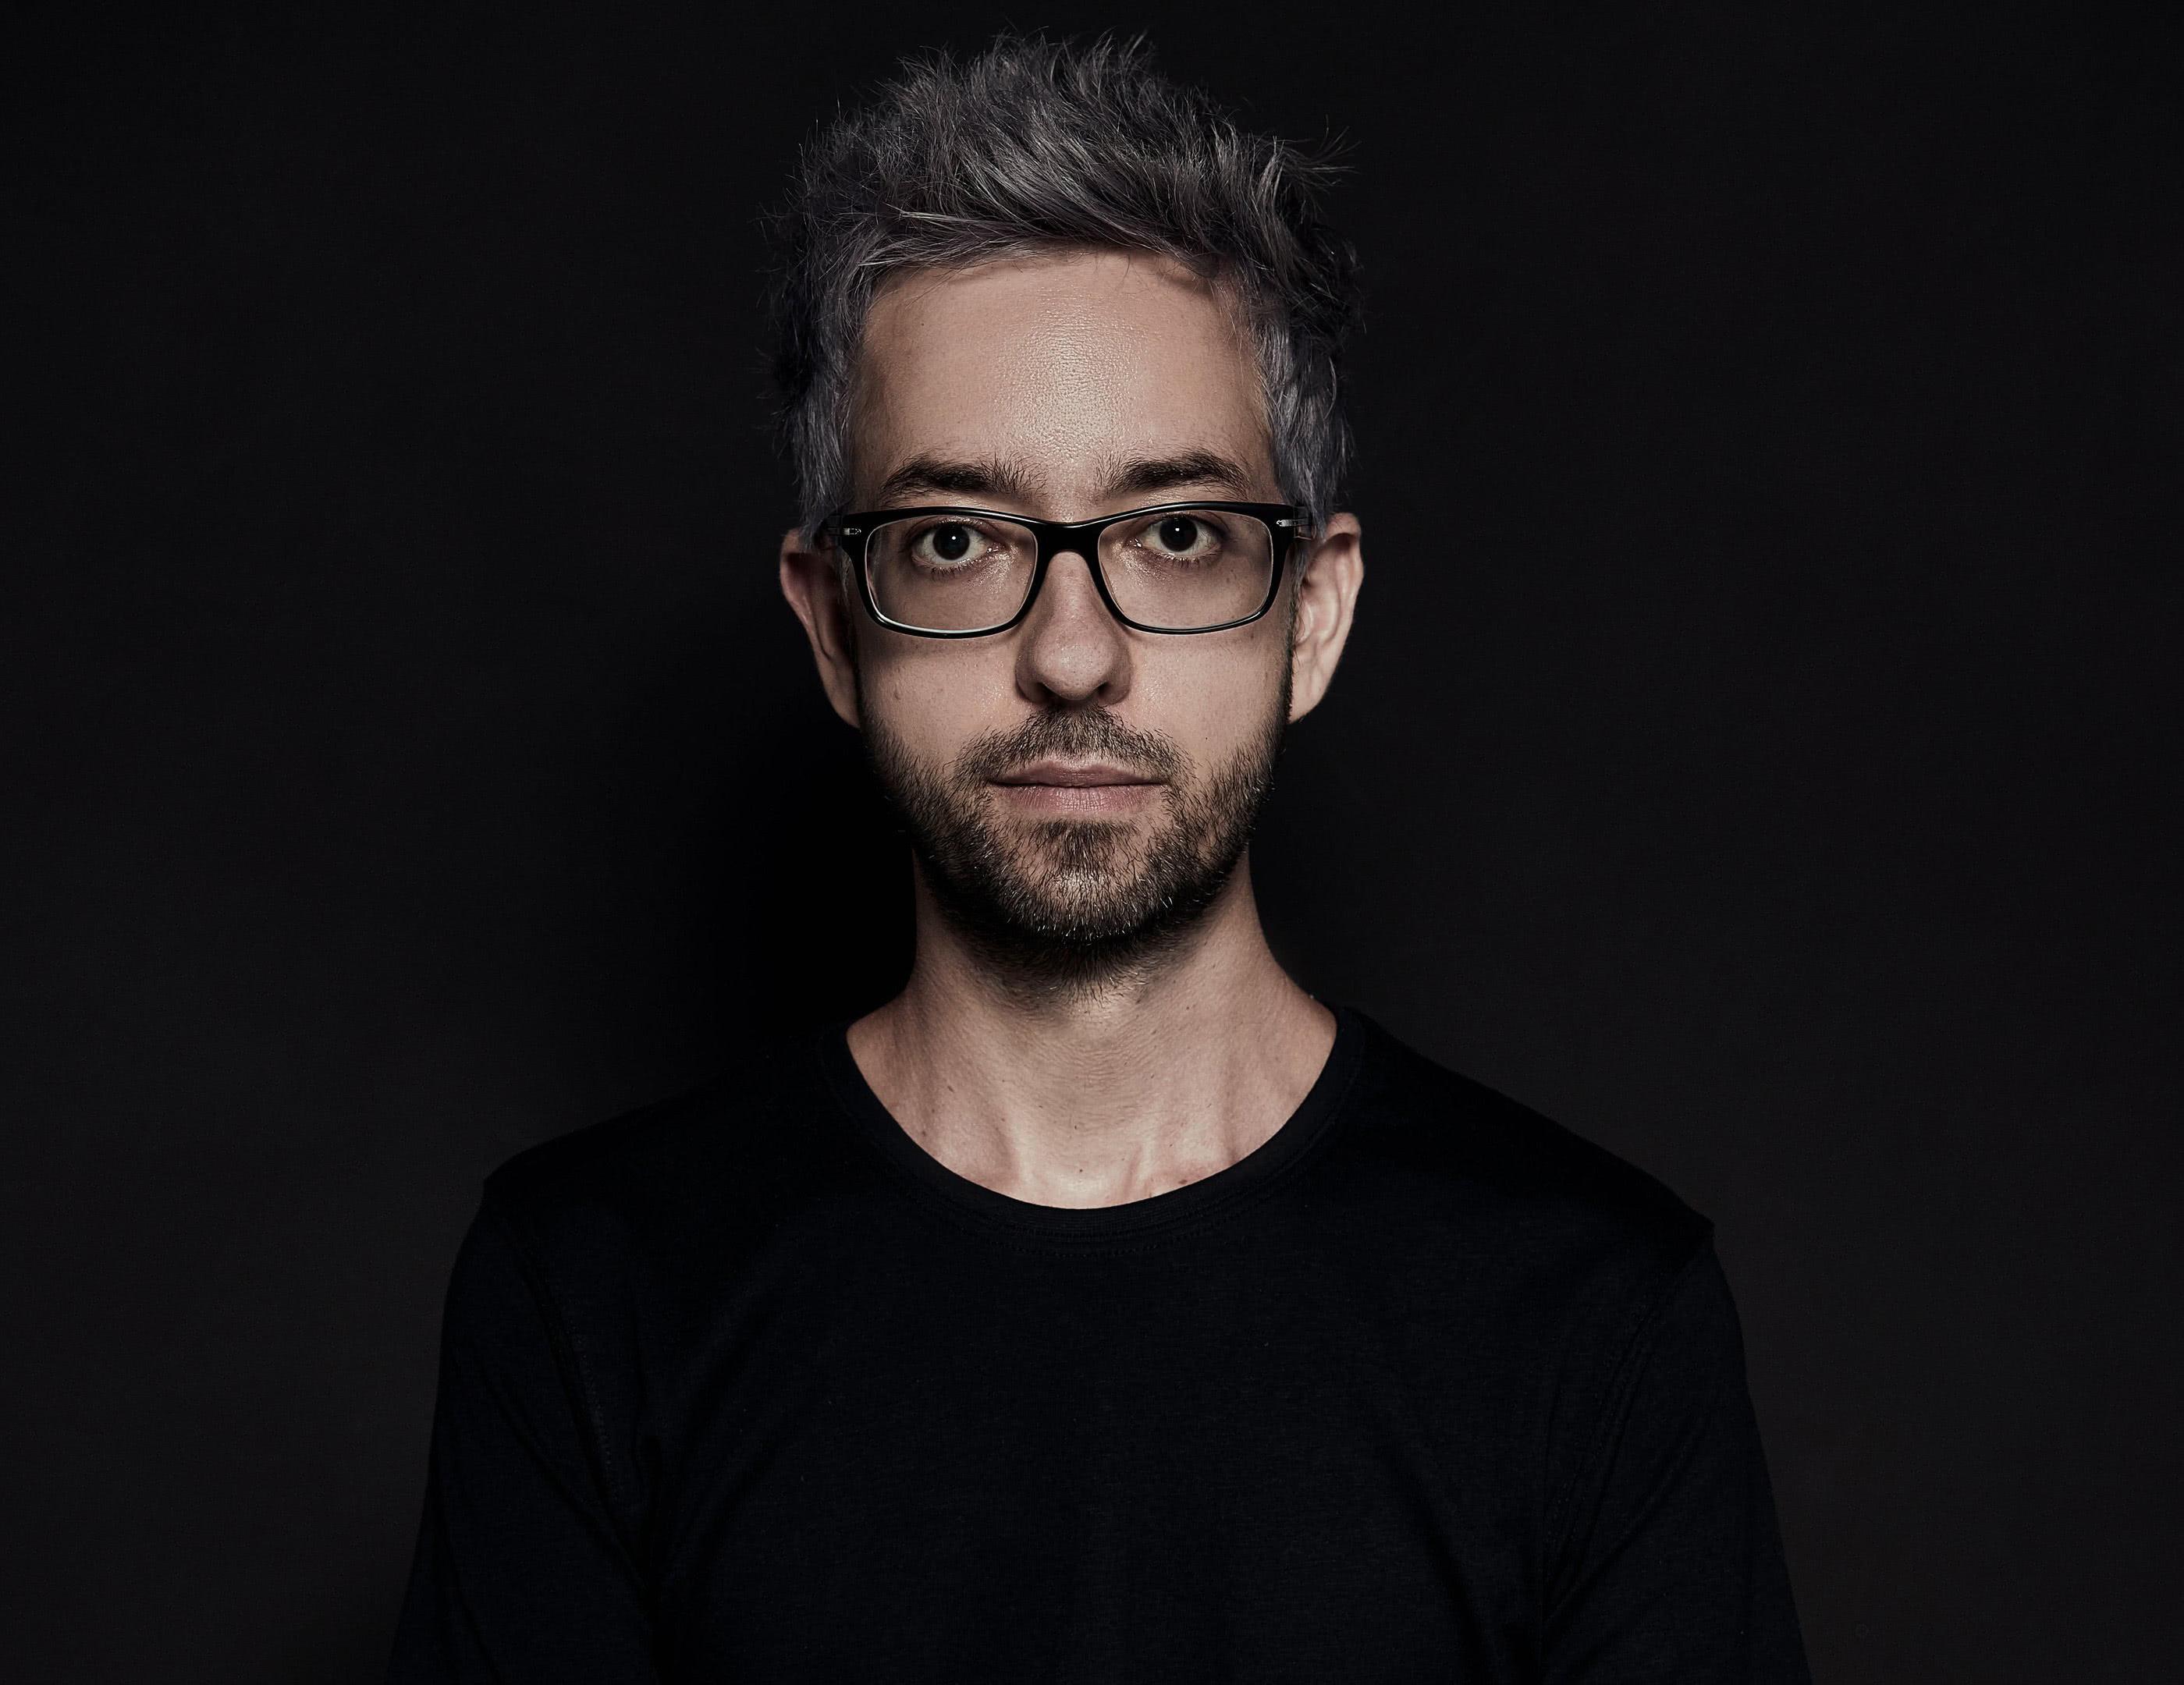 Photography of Ignacio in a dark background